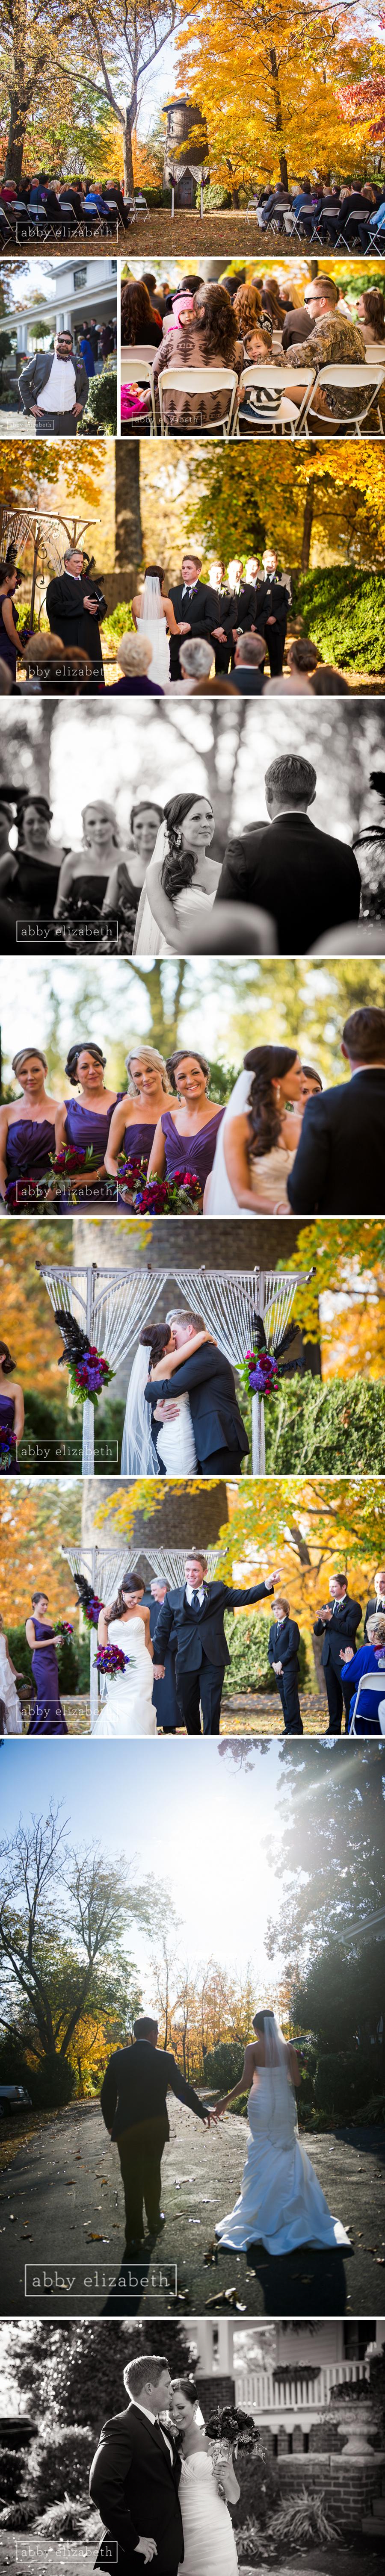 Fall_Wedding_Knoxville_TN_28.jpg